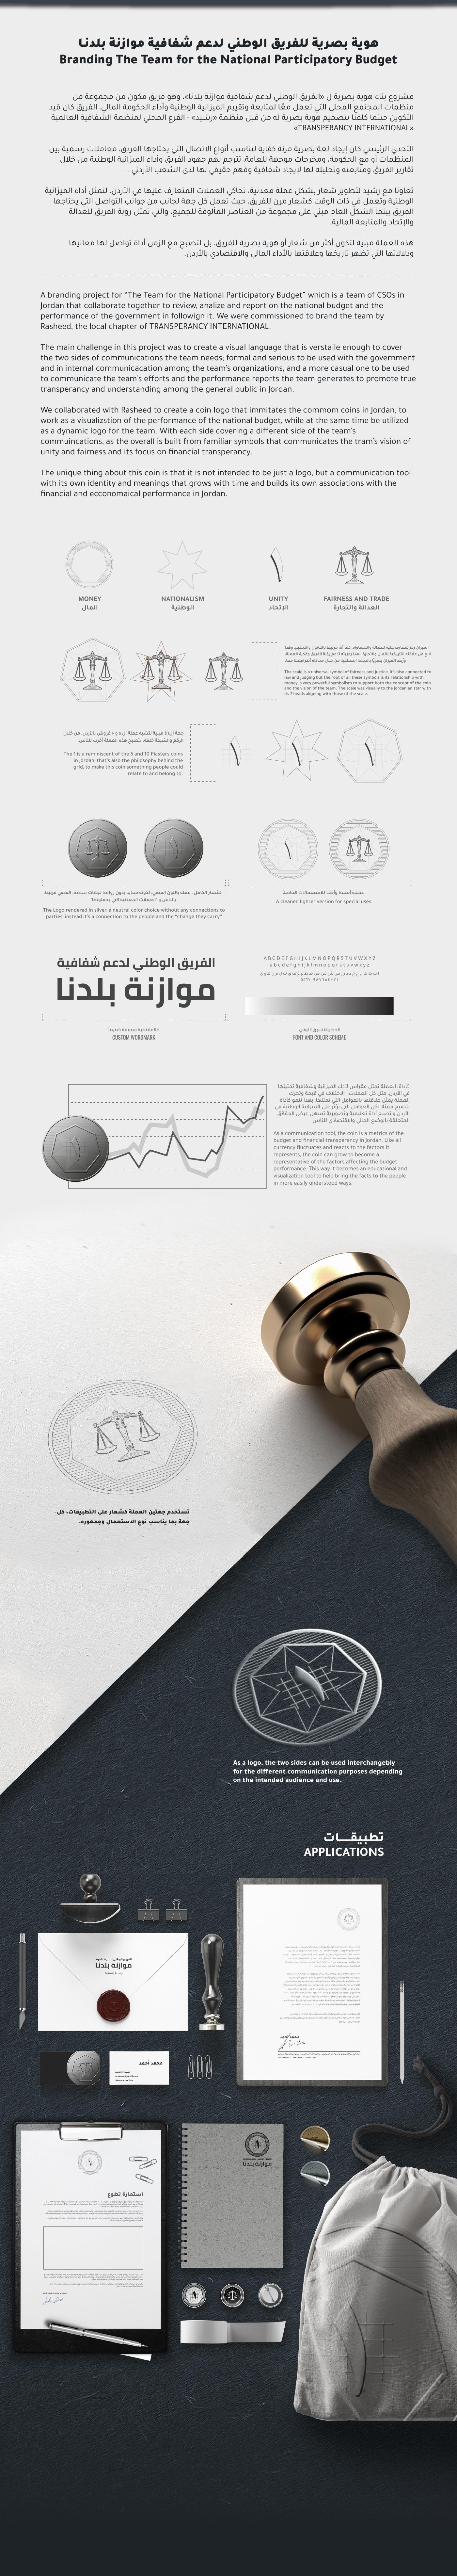 branding  design visual identity logo brand MENA REGION arabic anti-corruption financial participatory